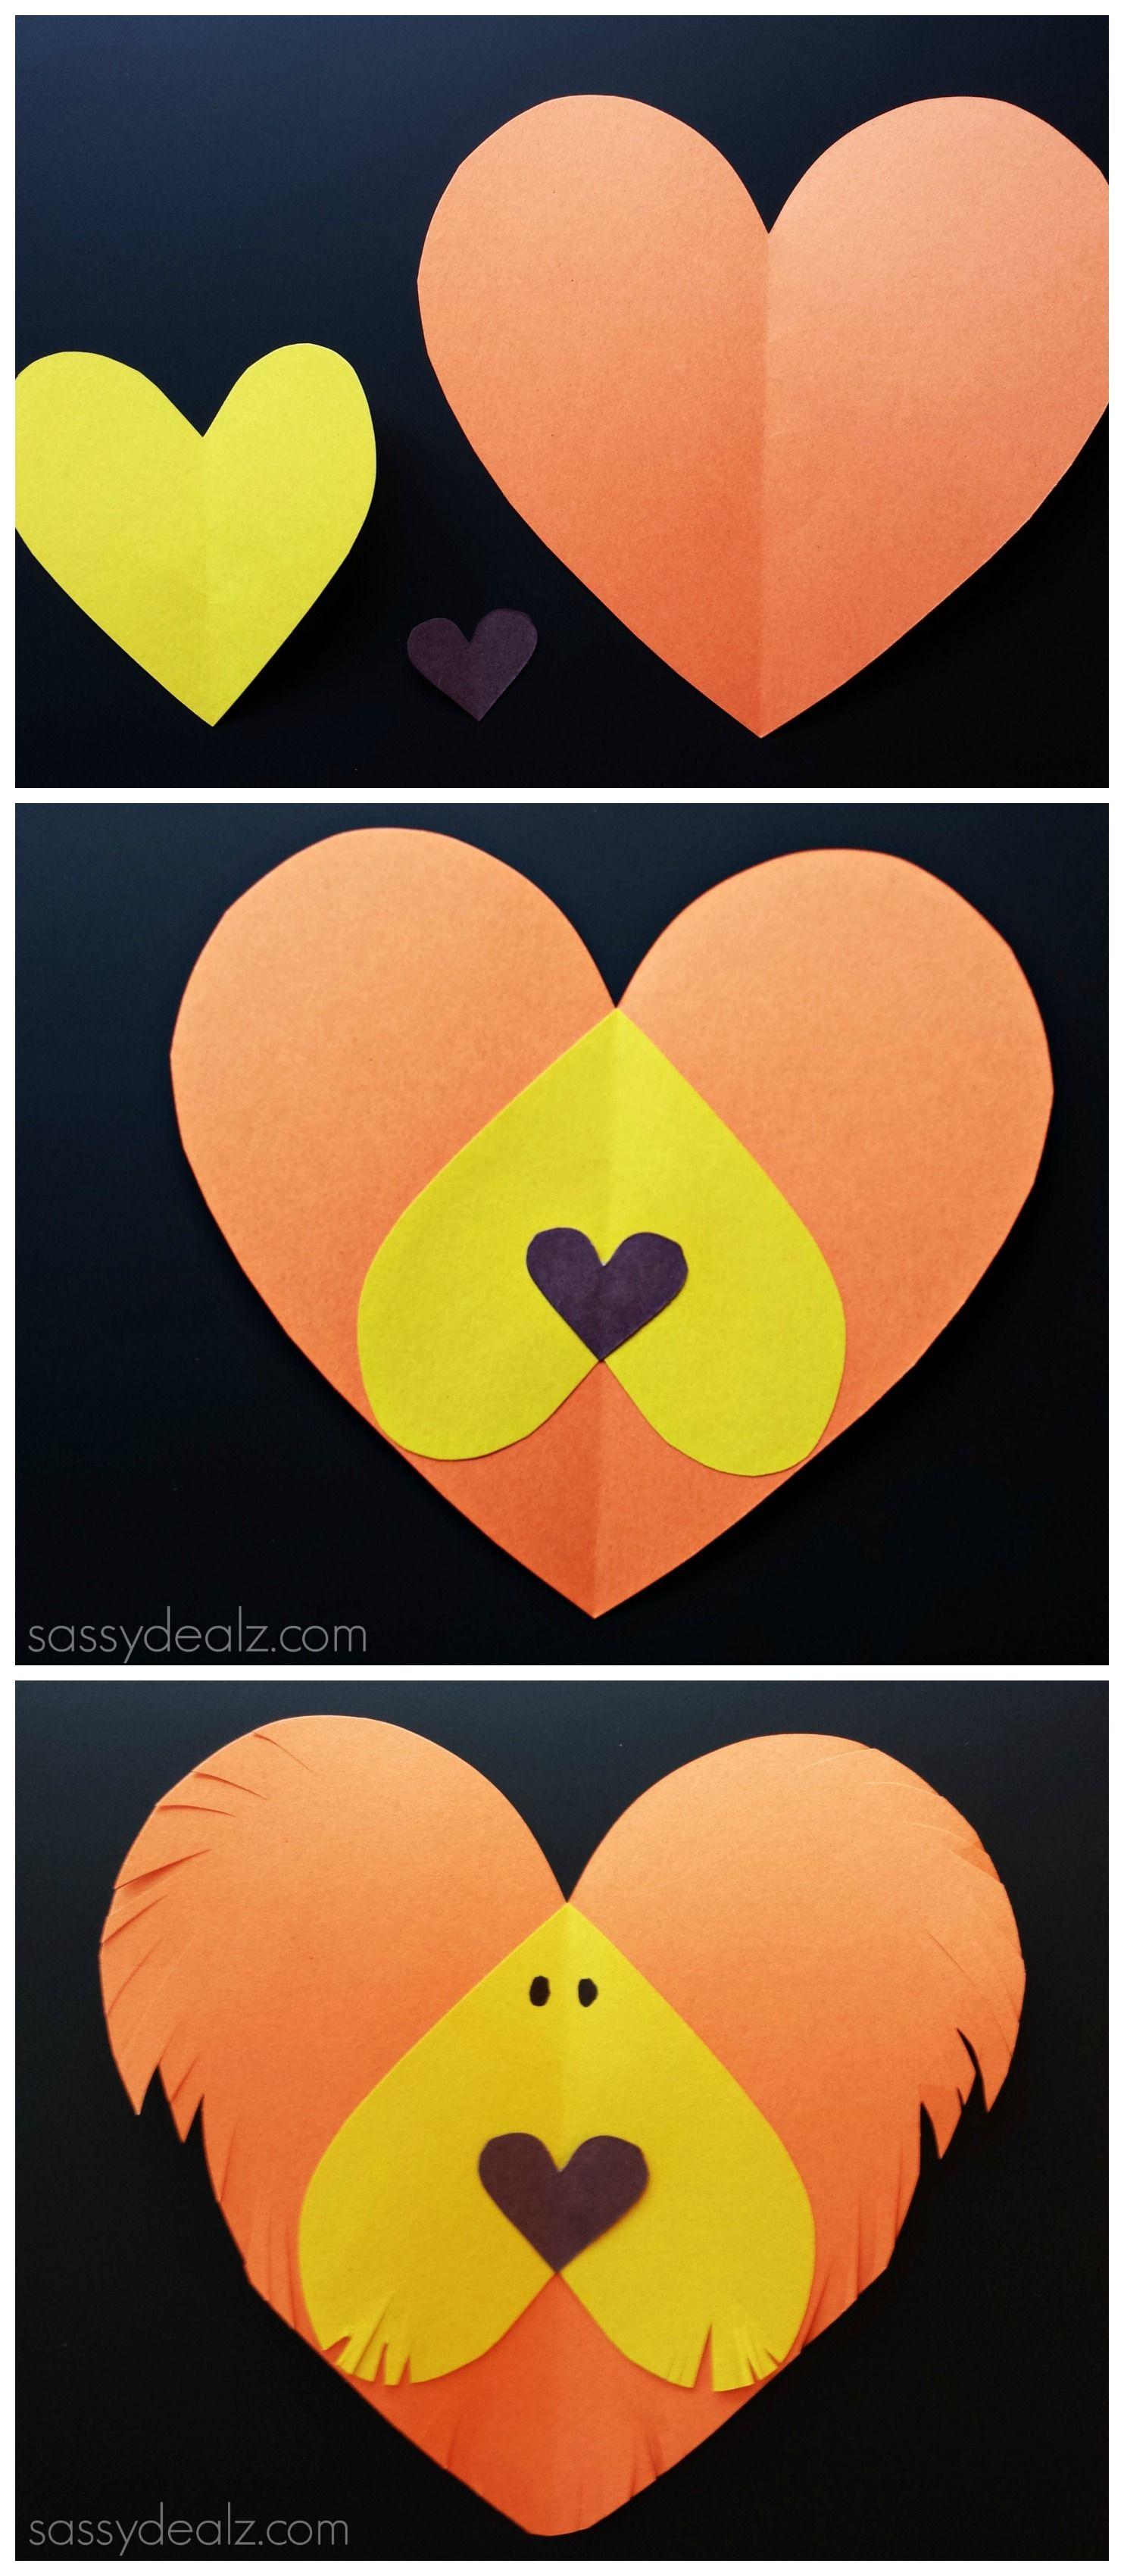 List Of Easy Valentine S Day Crafts For Kids Valentine S Day